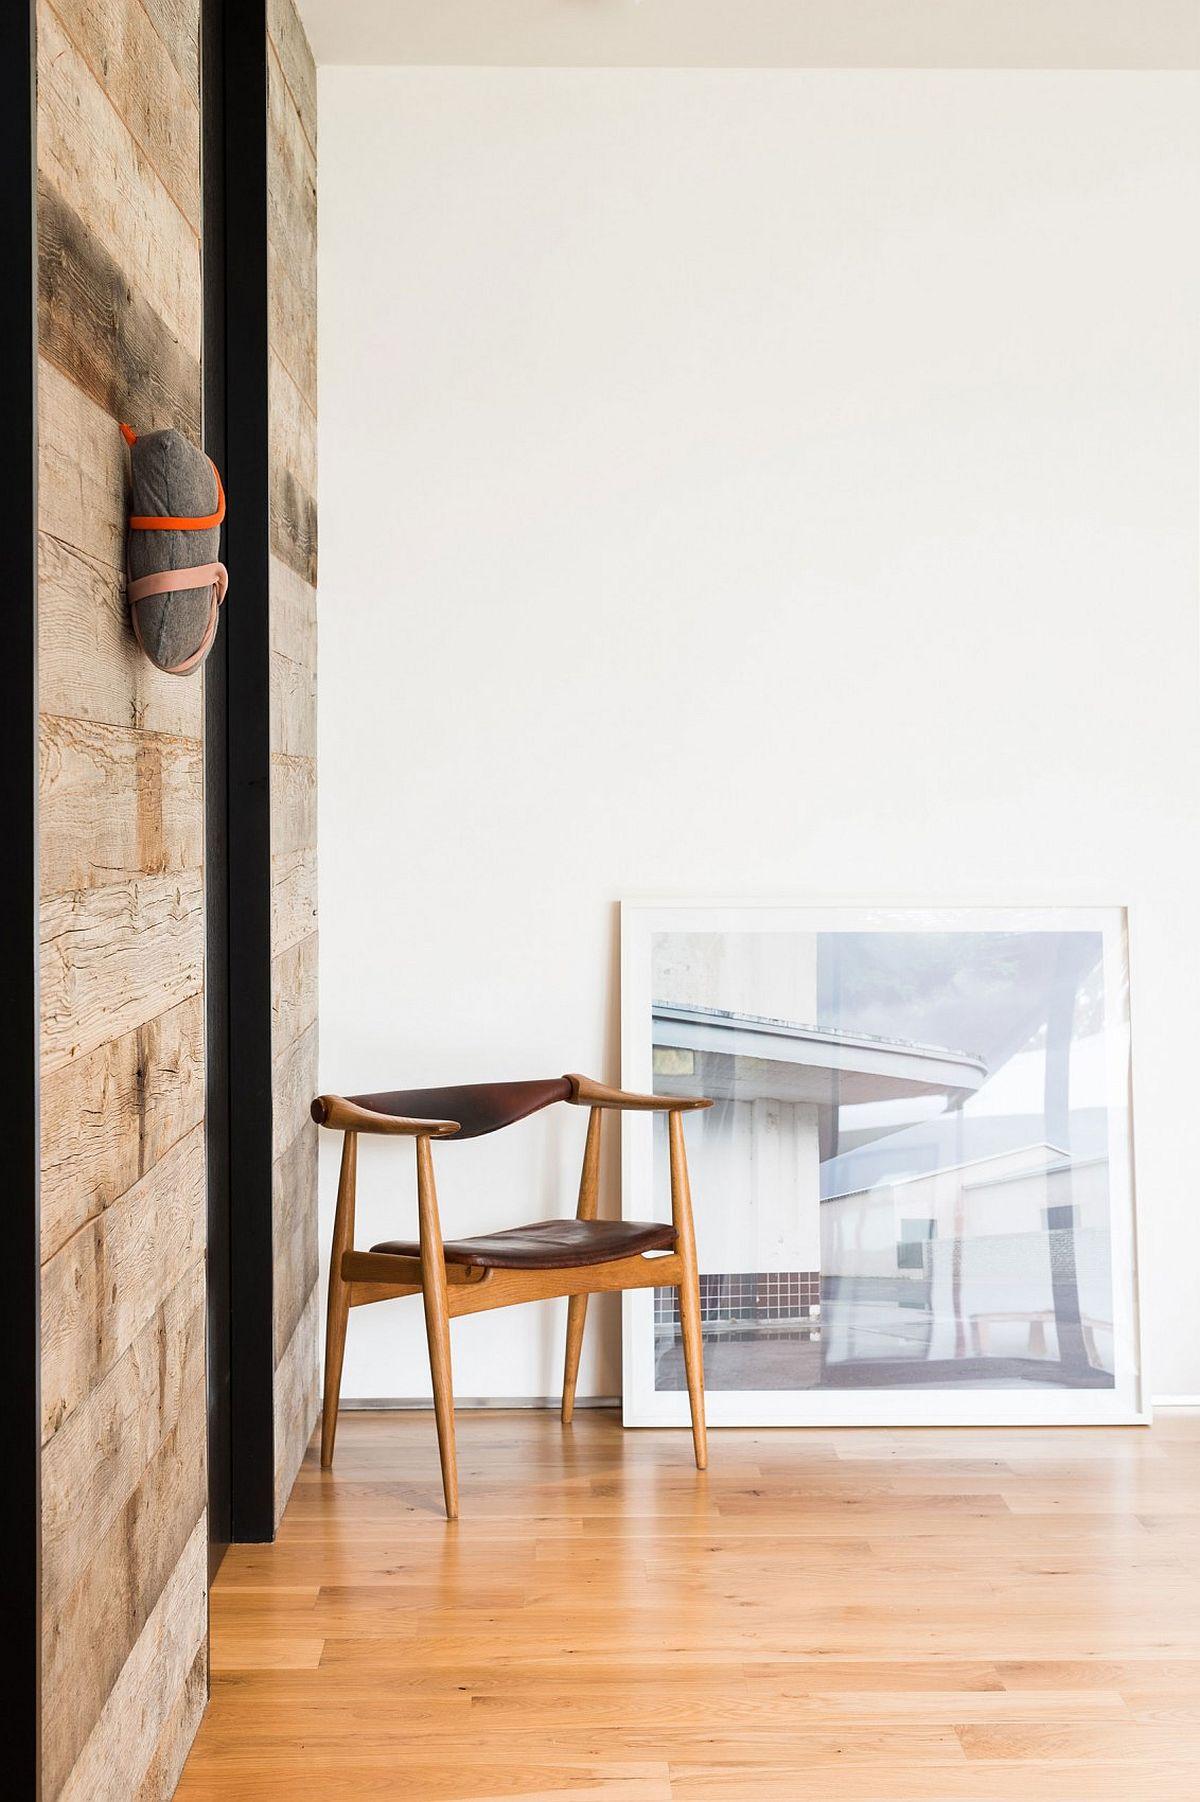 Timeless decor pieces bring class to the spacious Texas home